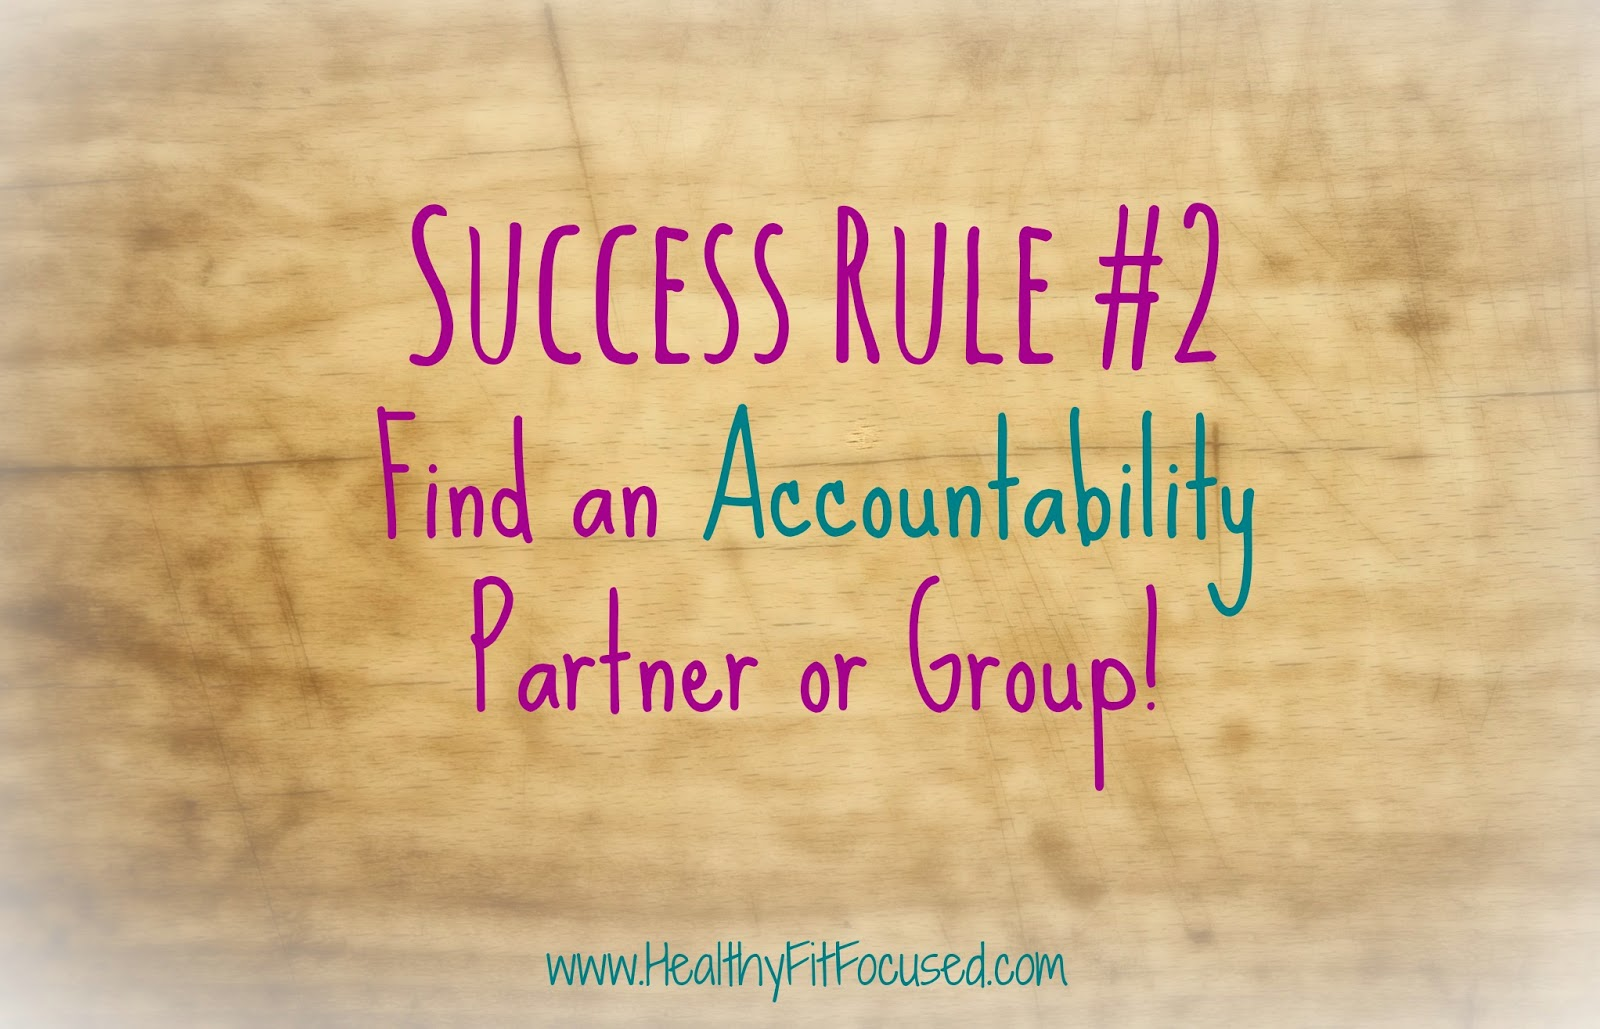 Accountability Group, www.healthyfitfocused.com